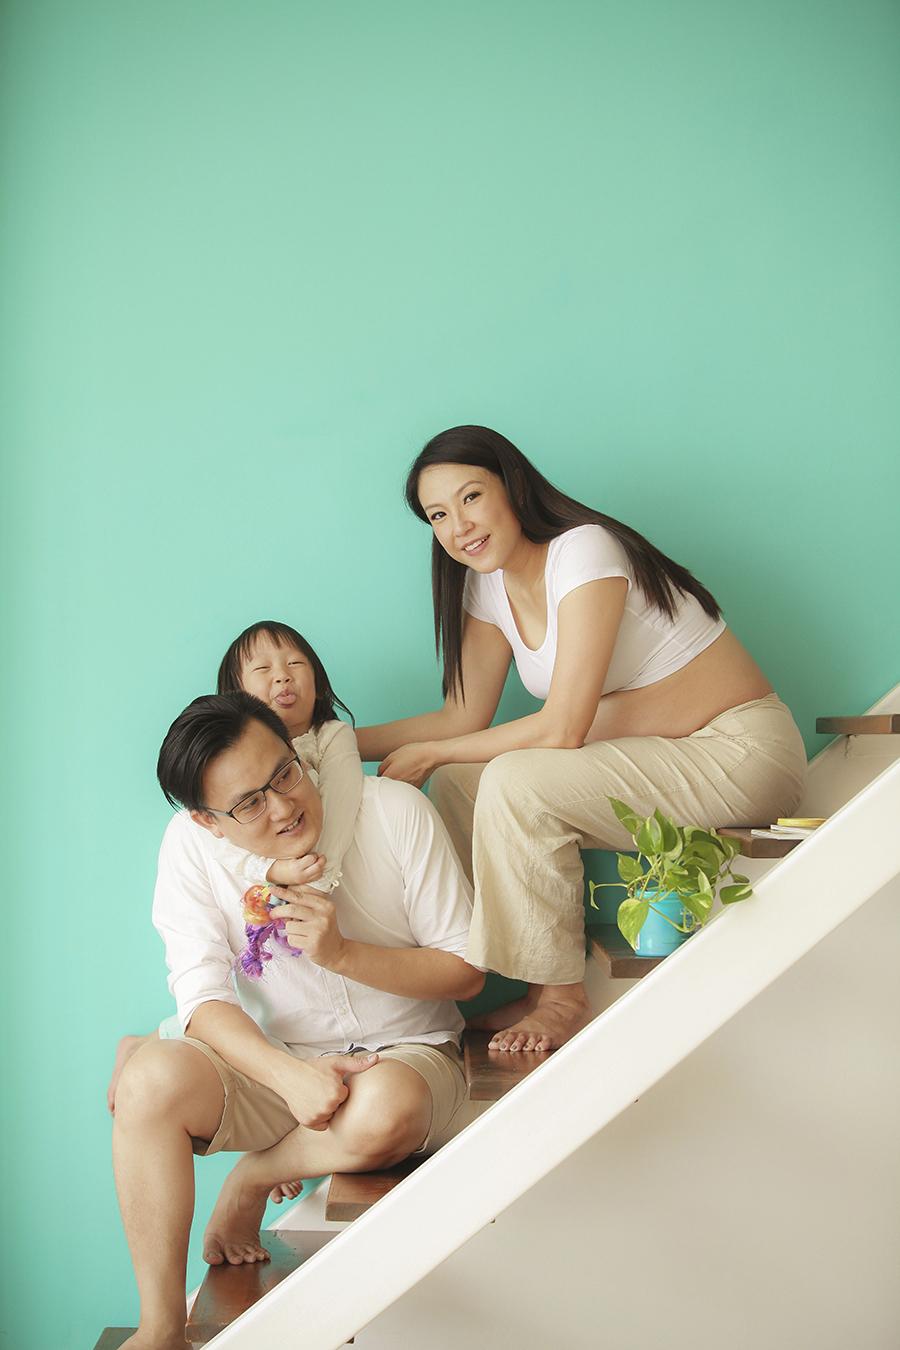 maternity + family portrait photography by kurt ahs . 9131.jpg